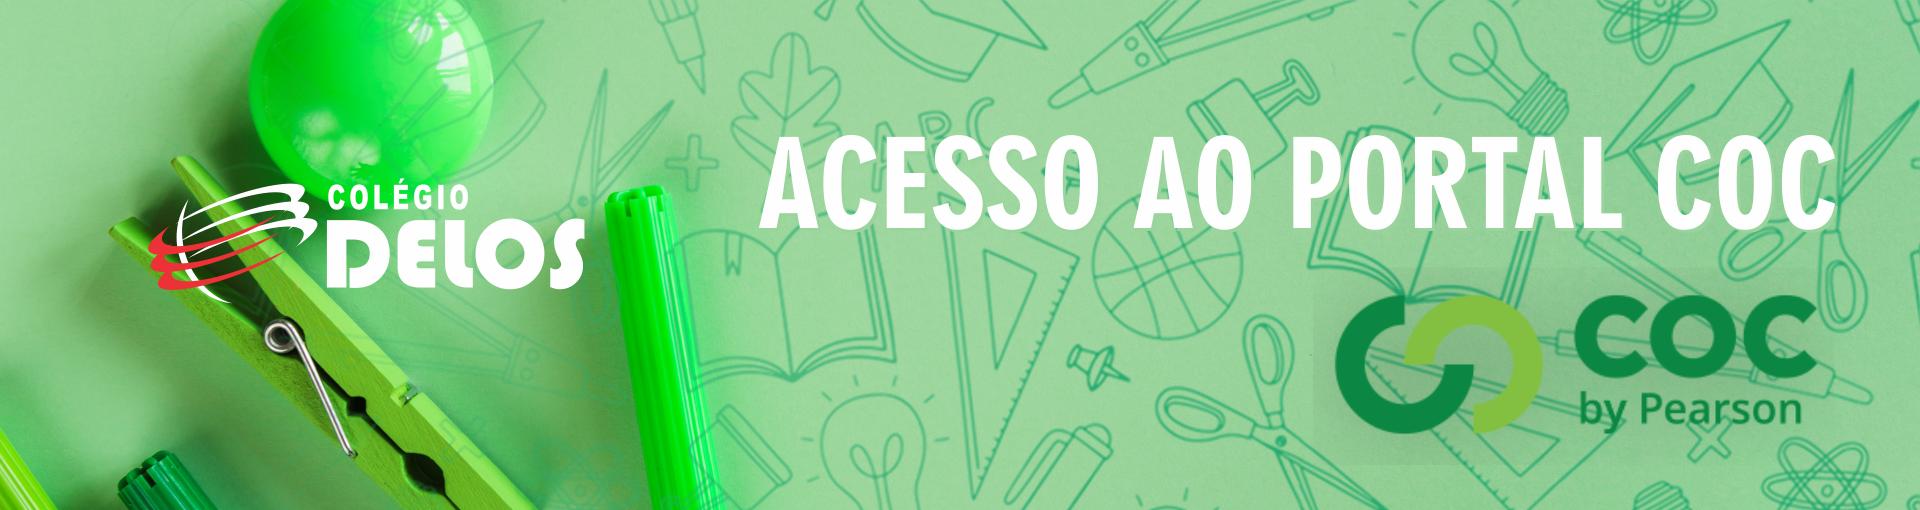 Academic composing argumentative essay test for your needs | Colégio Delos